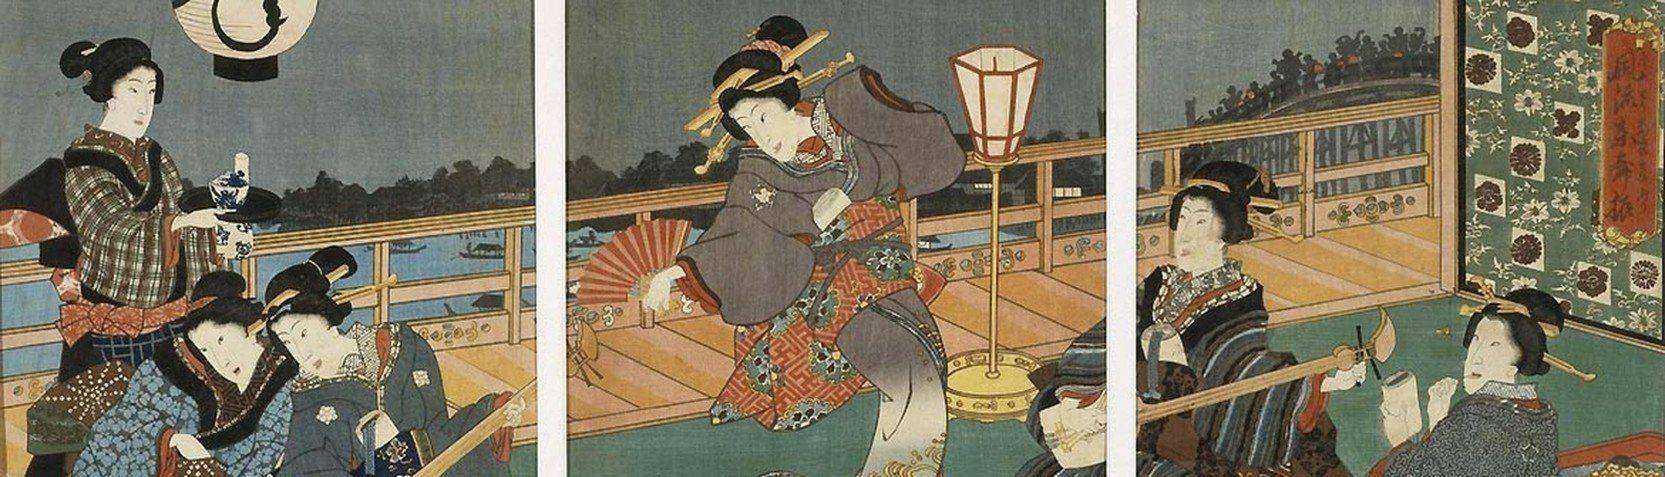 Artistas A-Z - Utagawa Kunisada